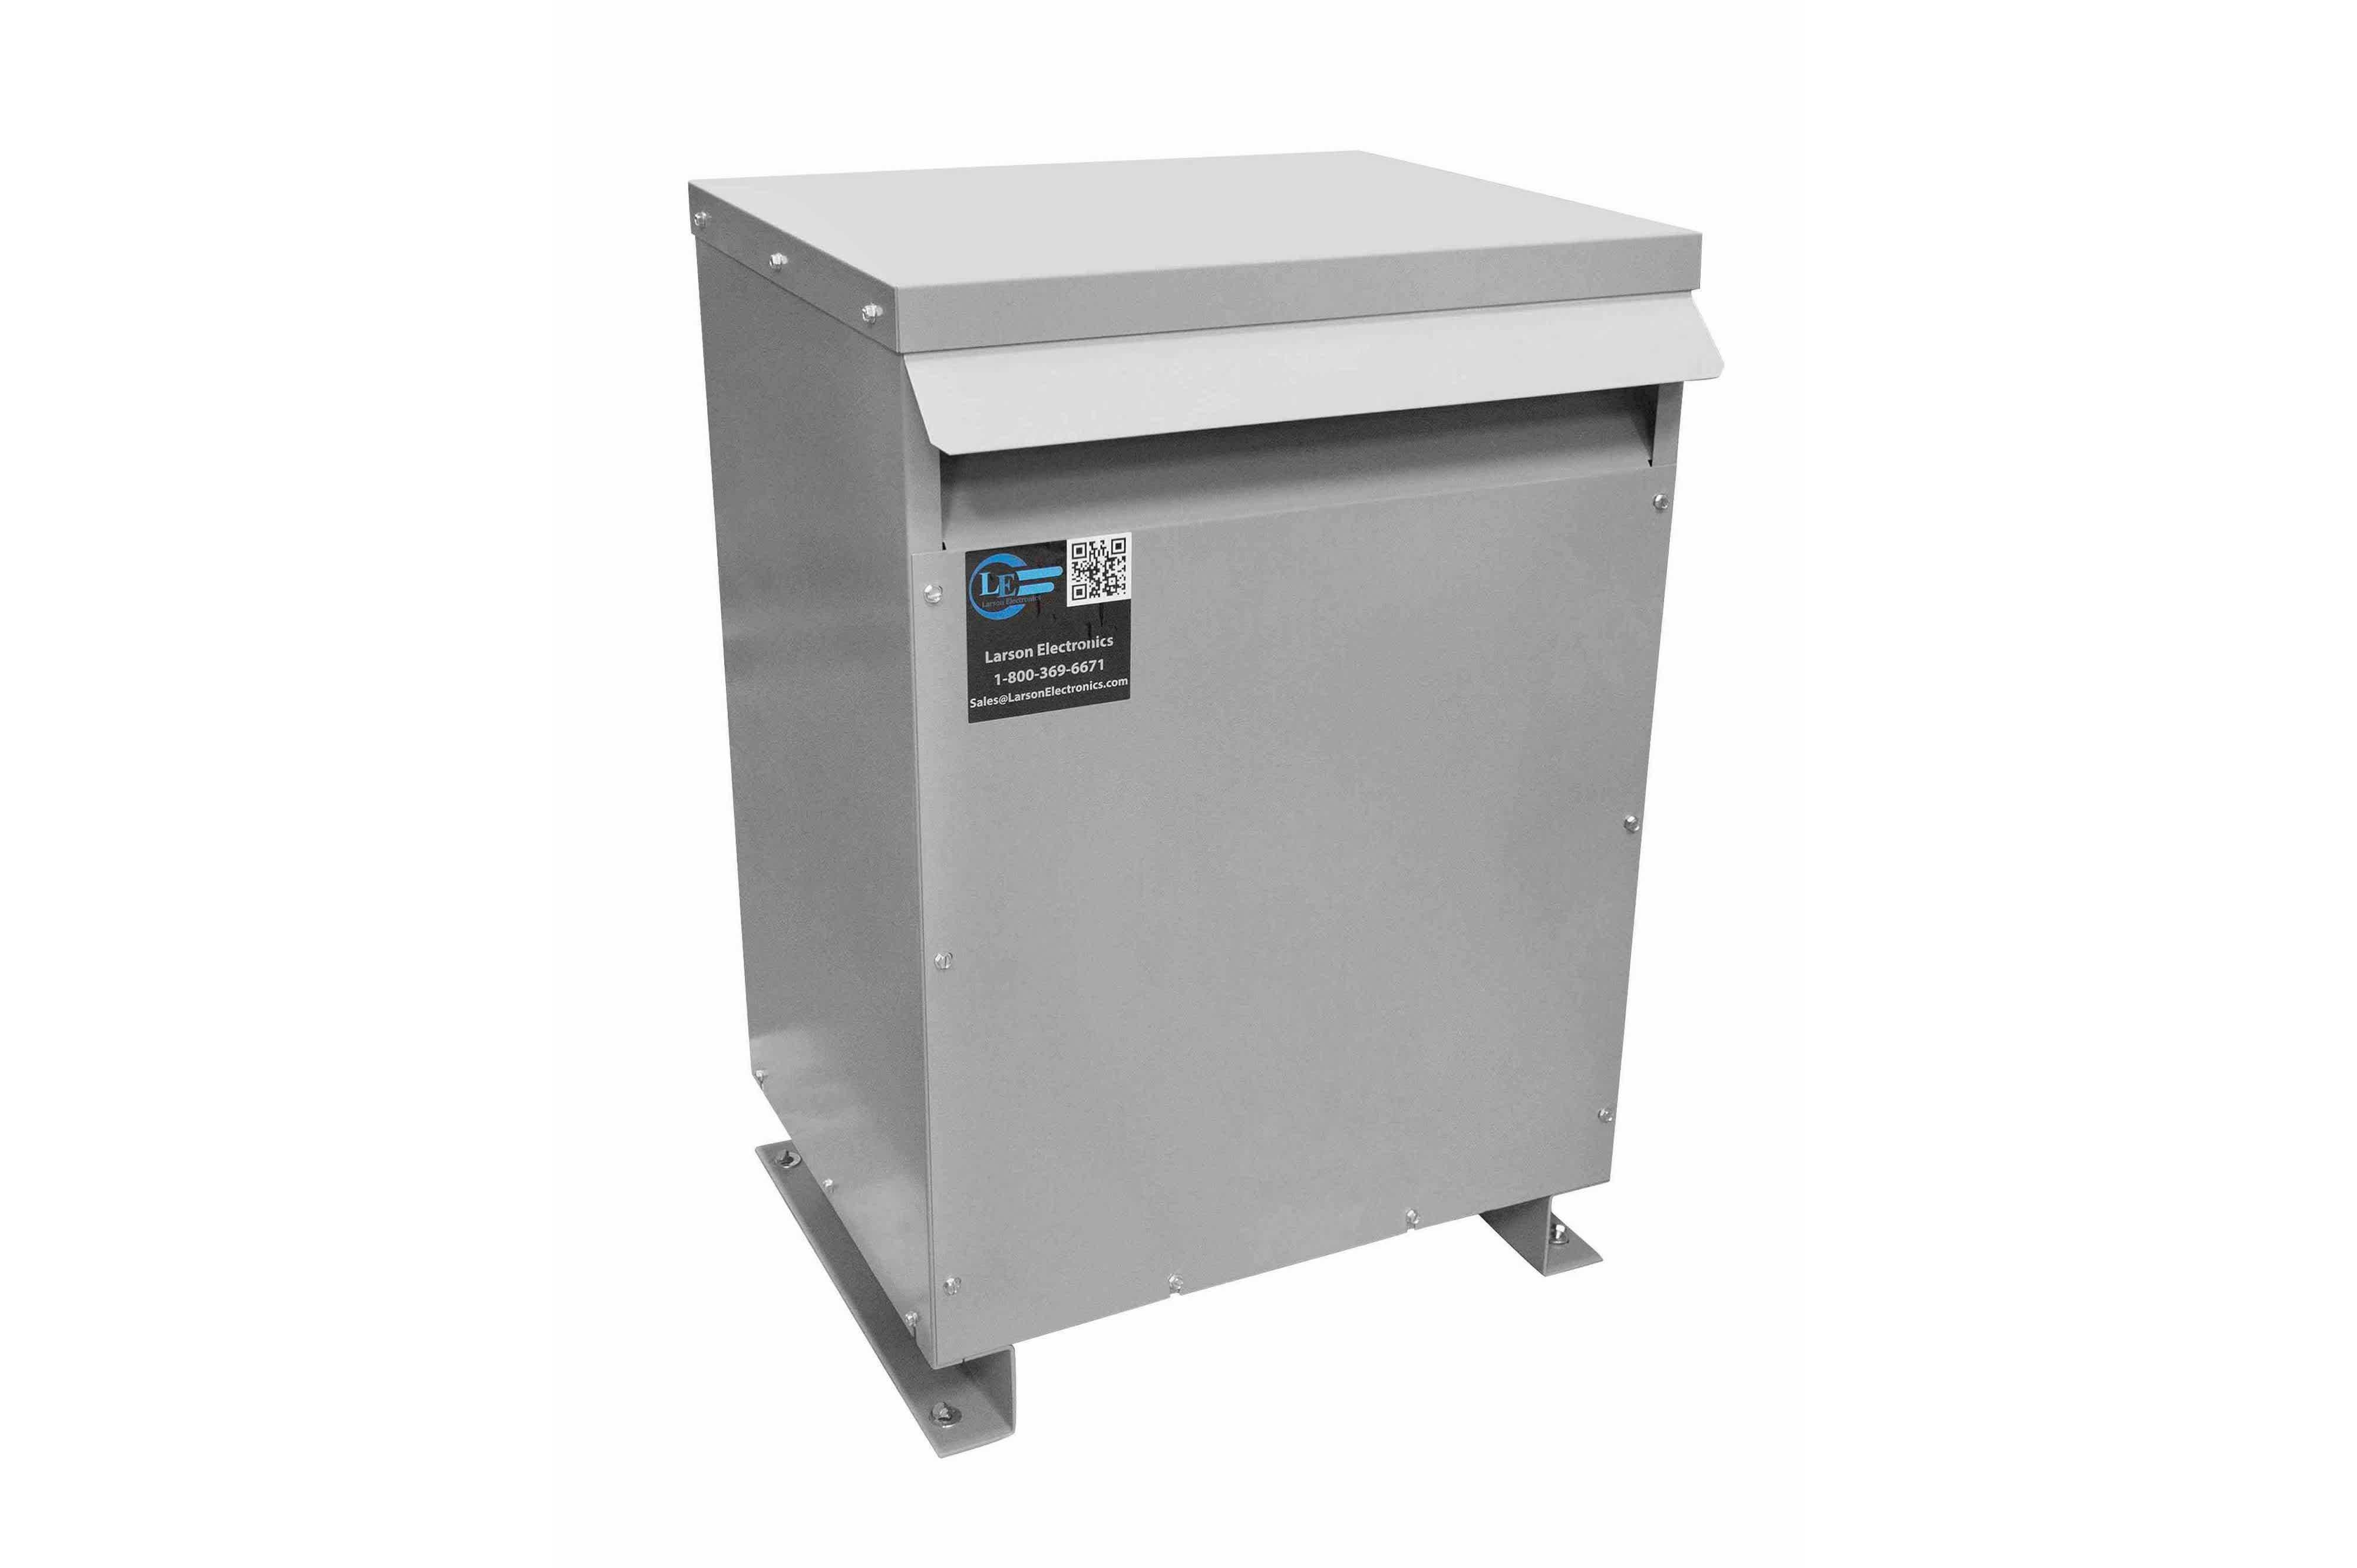 112.5 kVA 3PH Isolation Transformer, 480V Wye Primary, 415V Delta Secondary, N3R, Ventilated, 60 Hz